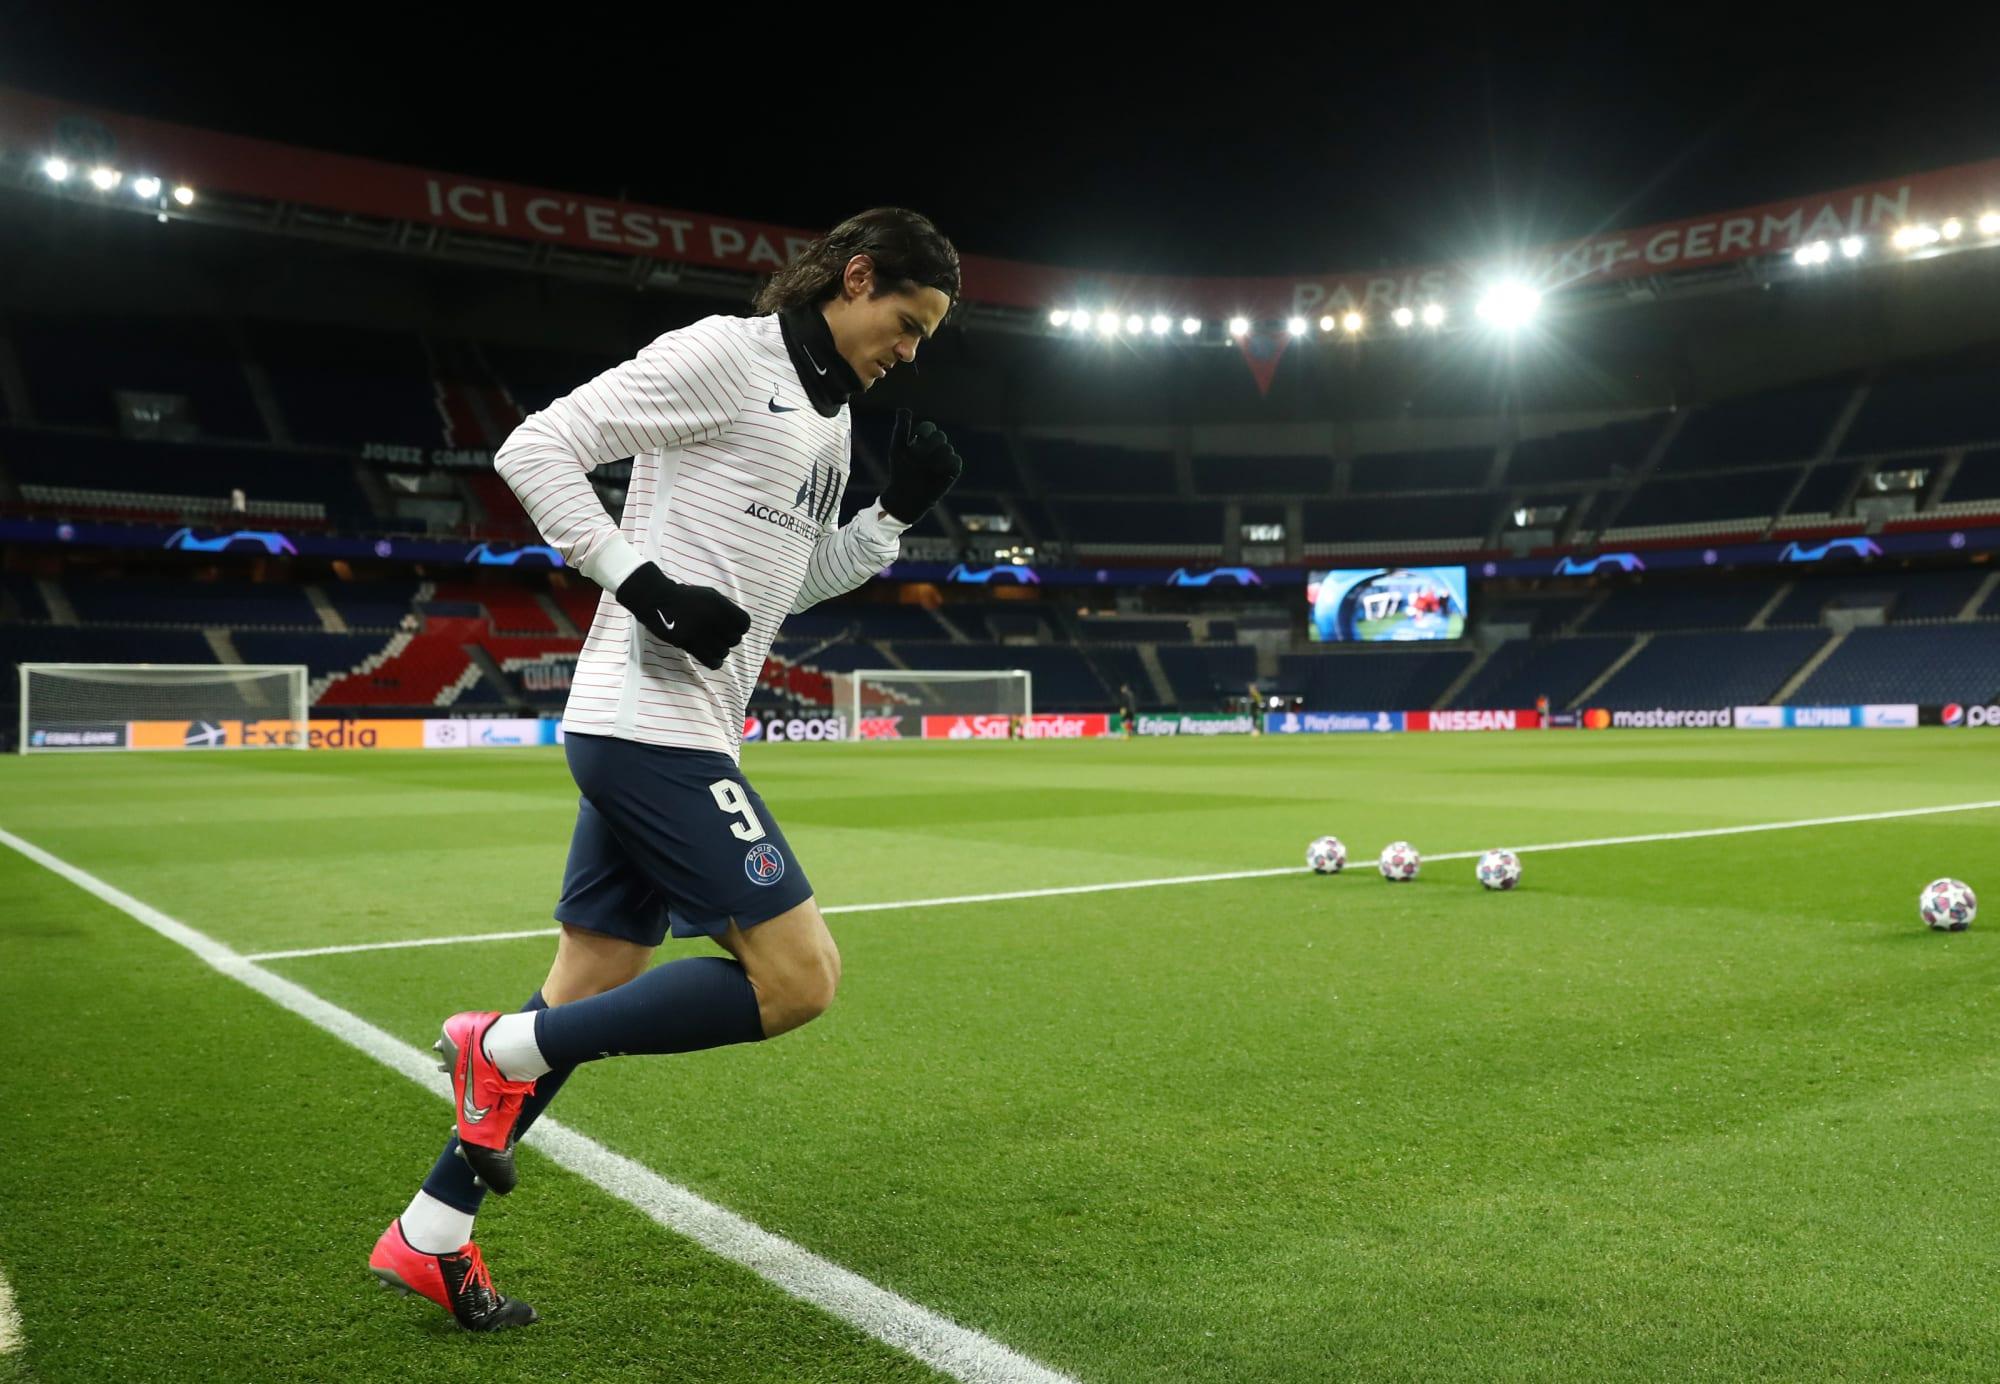 No, Real Madrid does not need Edinson Cavani